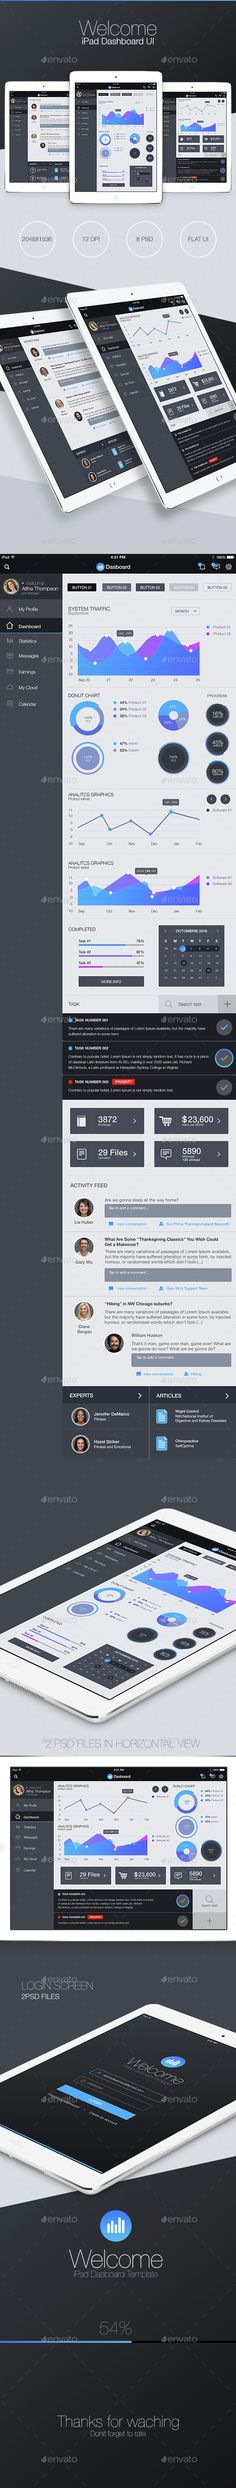 iPad Dashboard UI (User Interfaces)